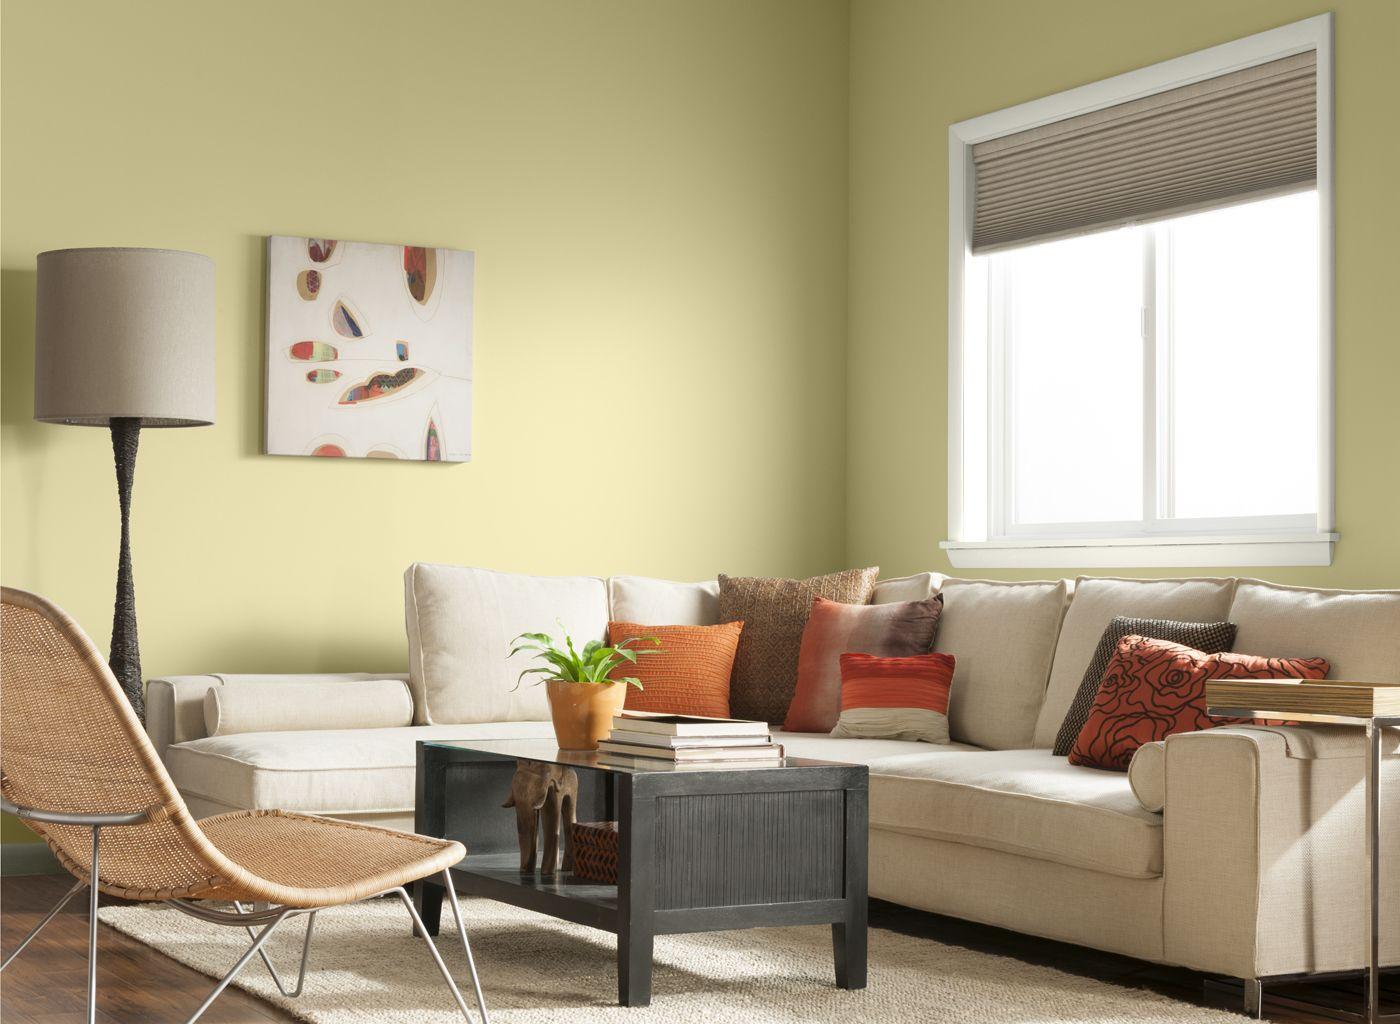 Living Room in Daisy Yellow | LIVINGROOMS | Pinterest | Living rooms ...